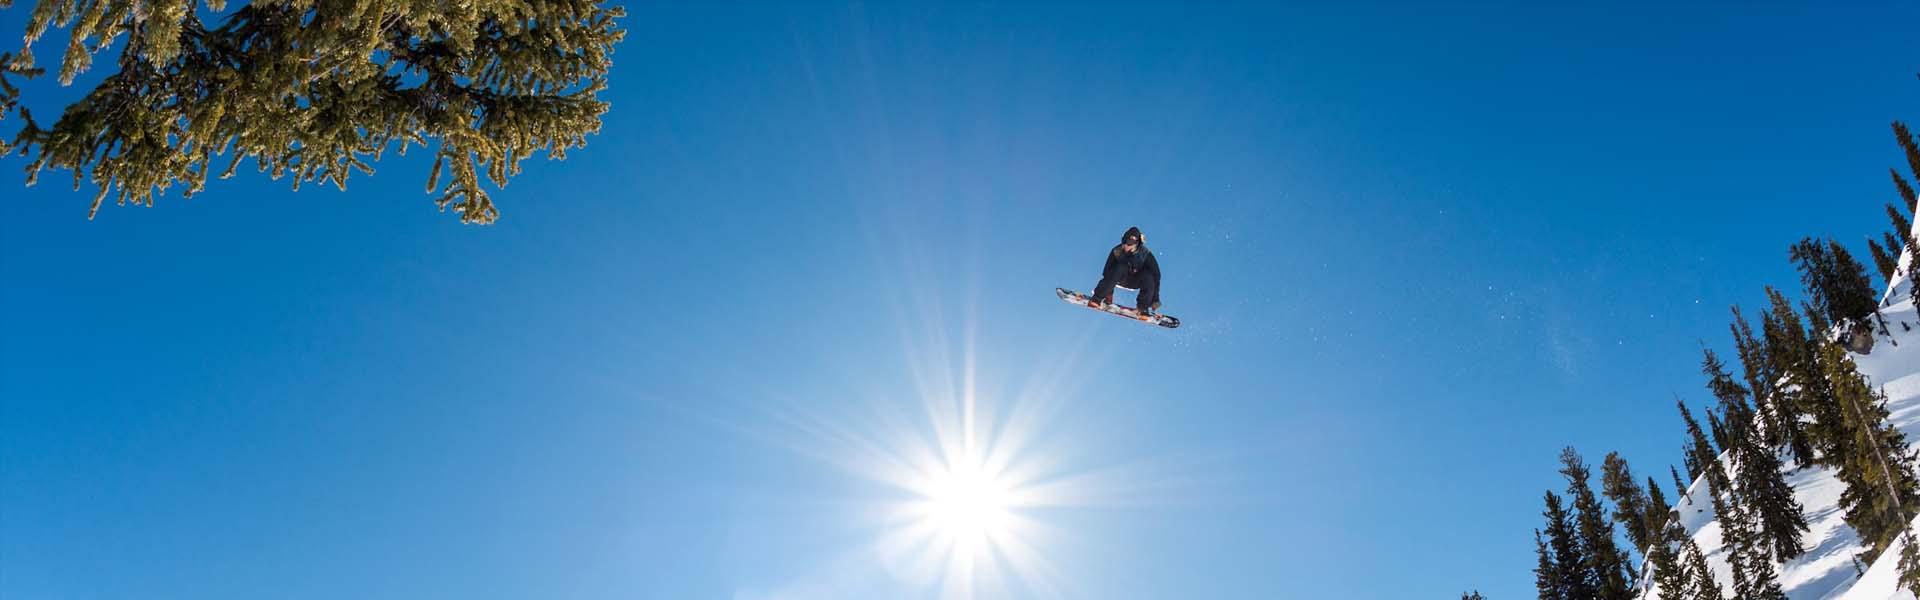 "Ingyenes streamen a snowboard ""Super Bowlja"""